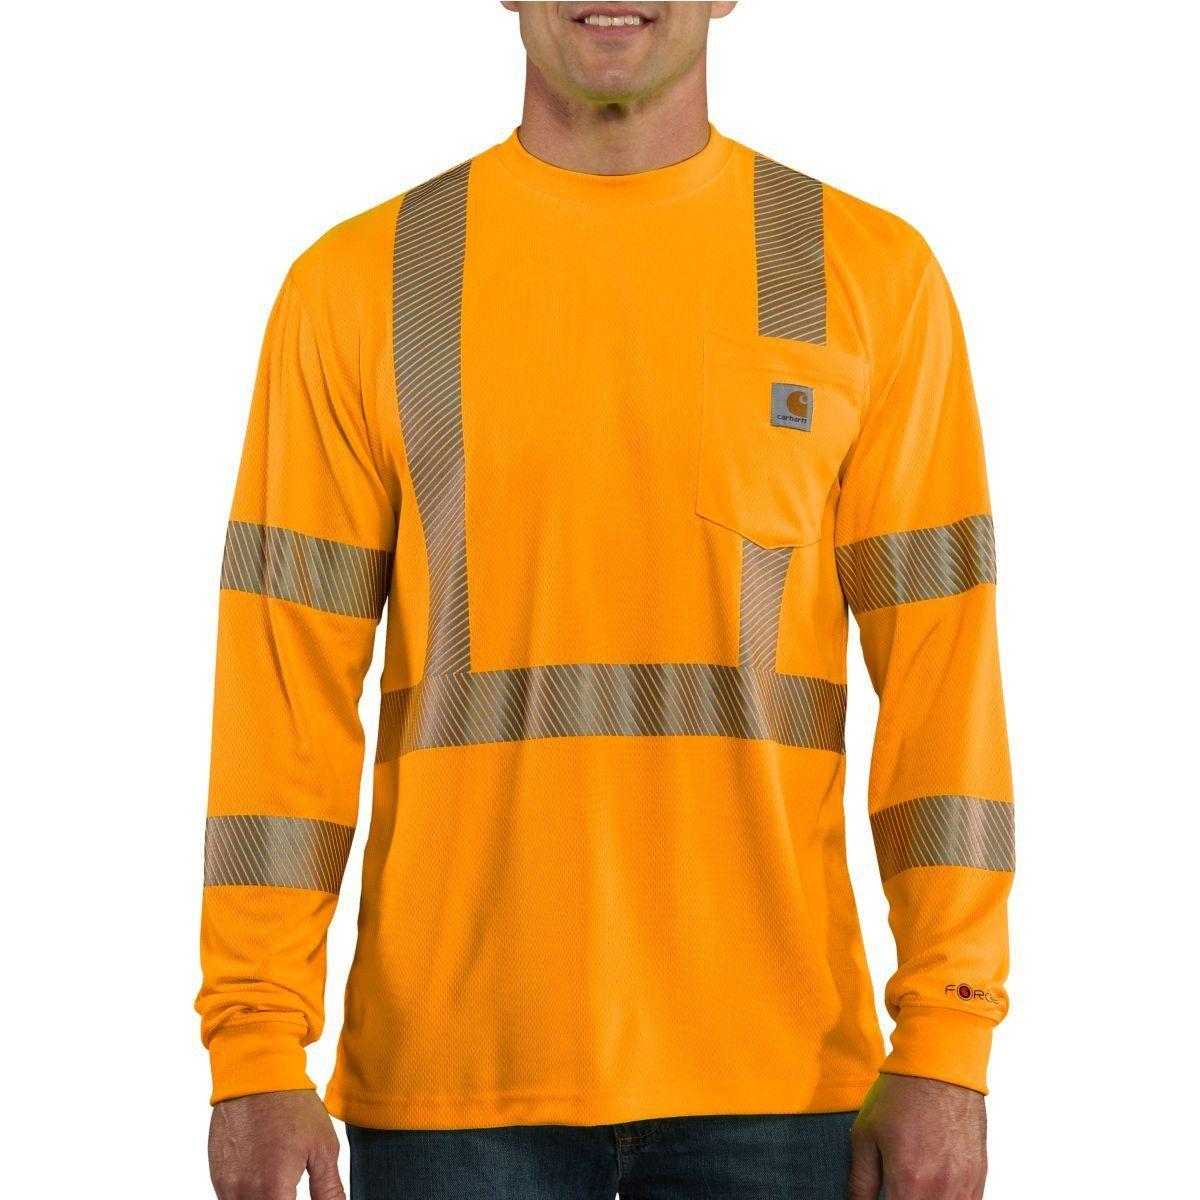 Carhartt mens brite orange high visibility force long